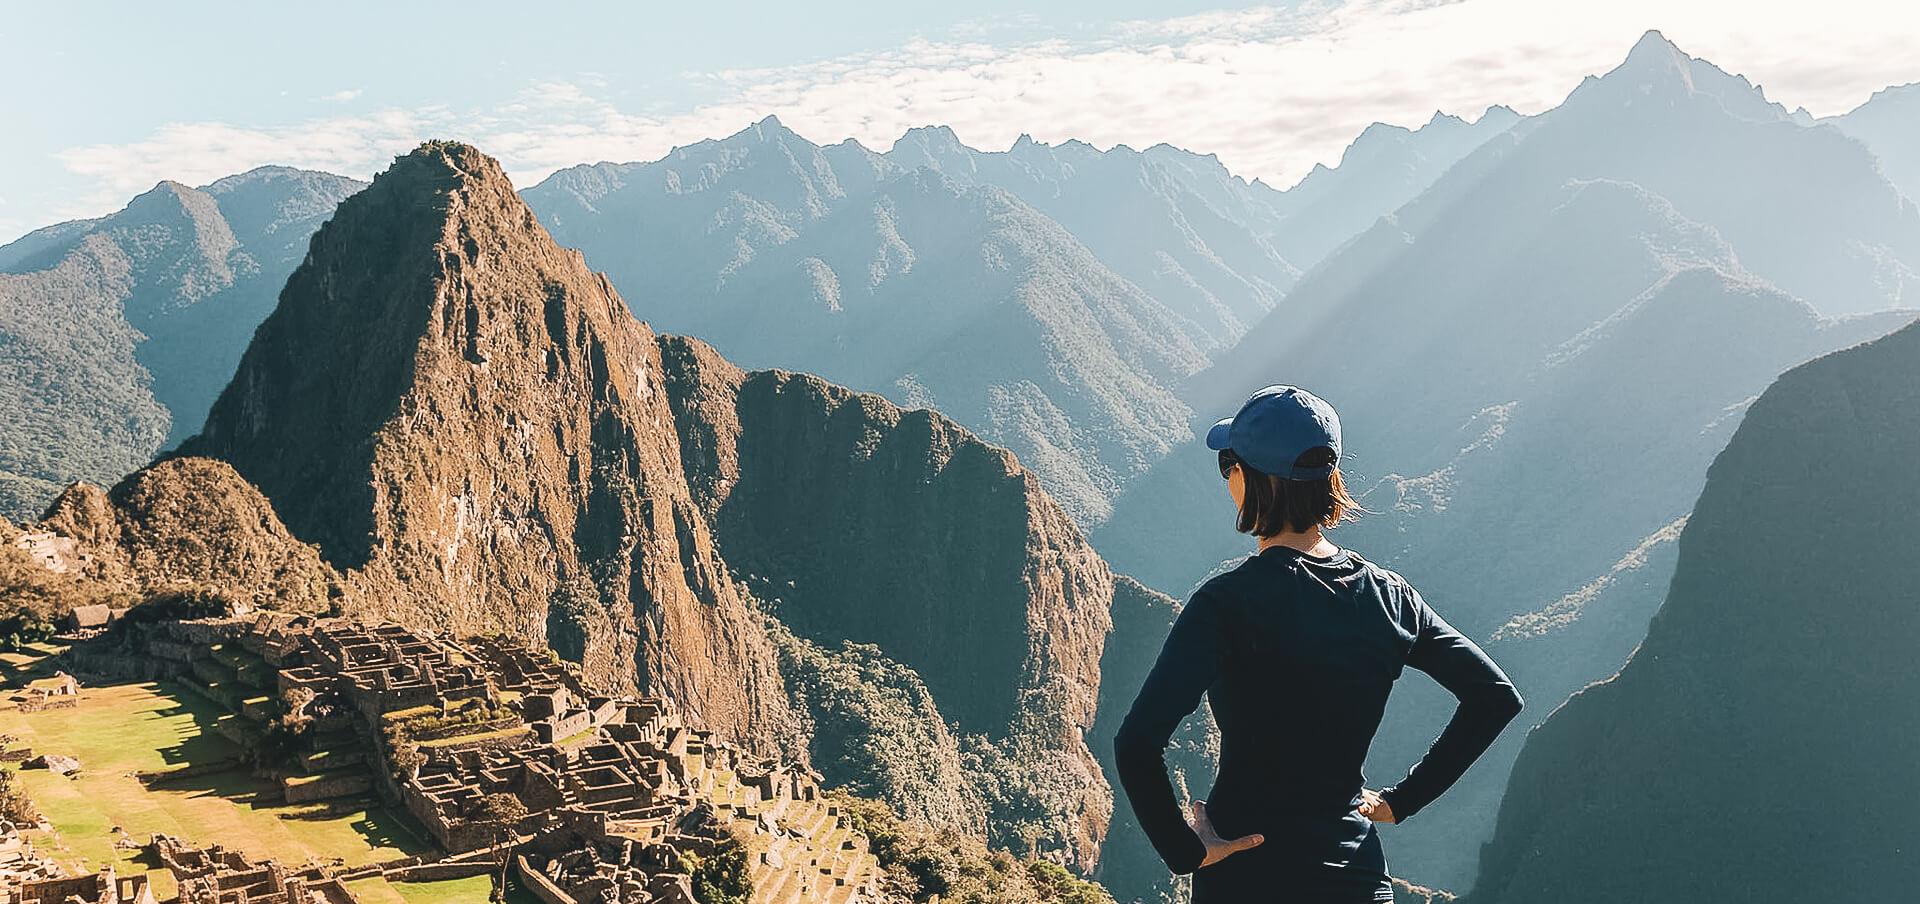 How long does its take to trek to Machu Picchu